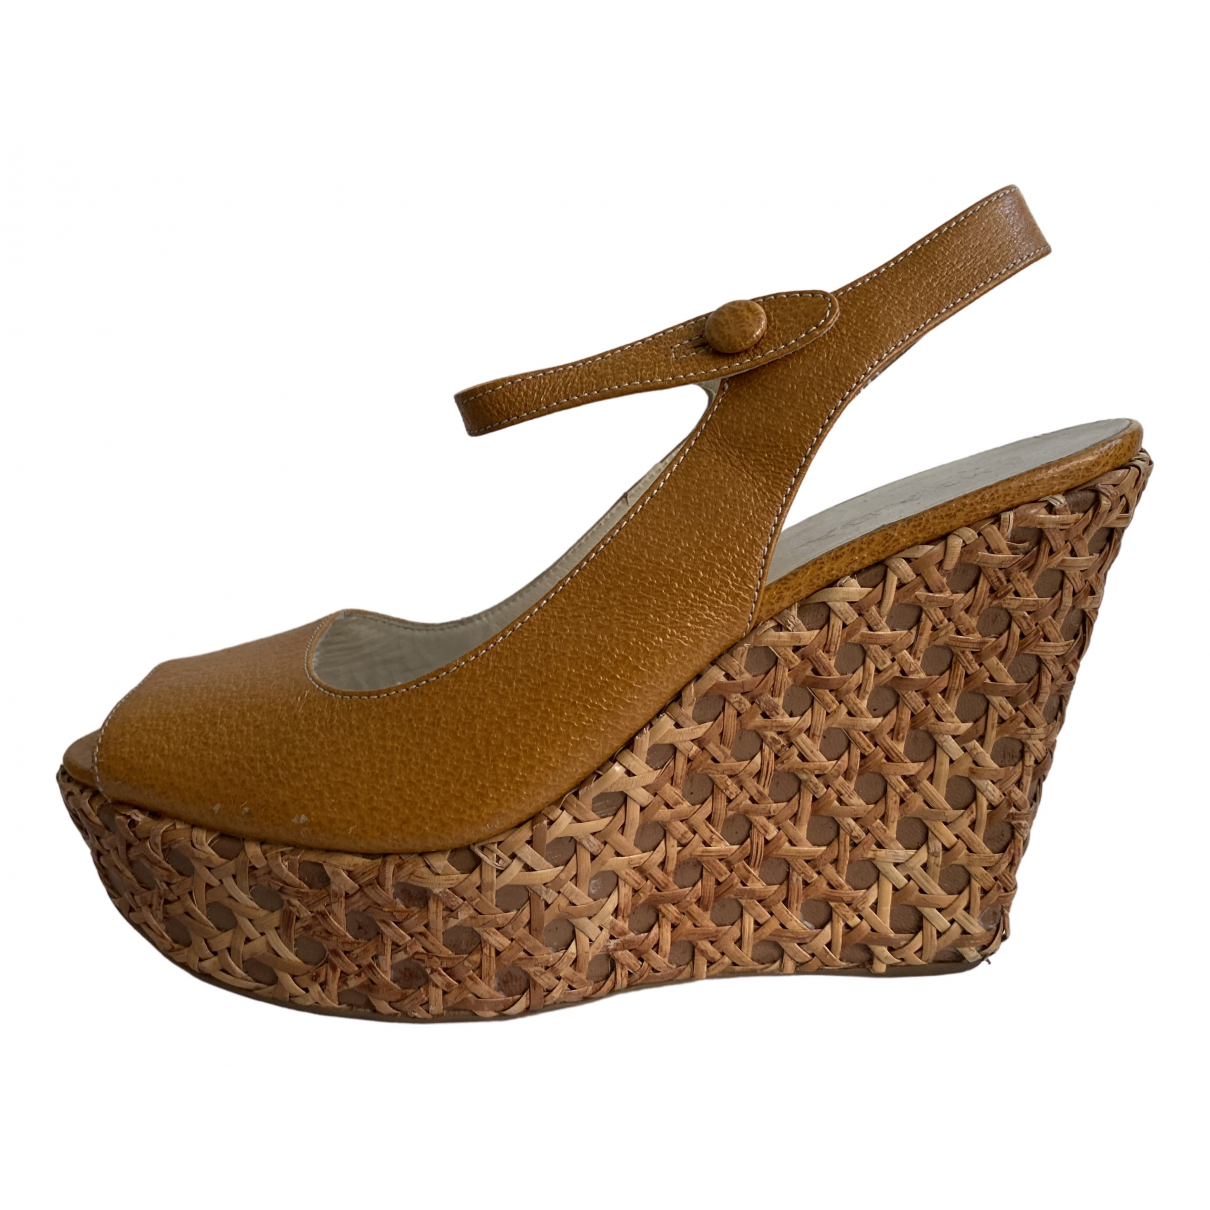 Prada \N Beige Leather Sandals for Women 36.5 IT